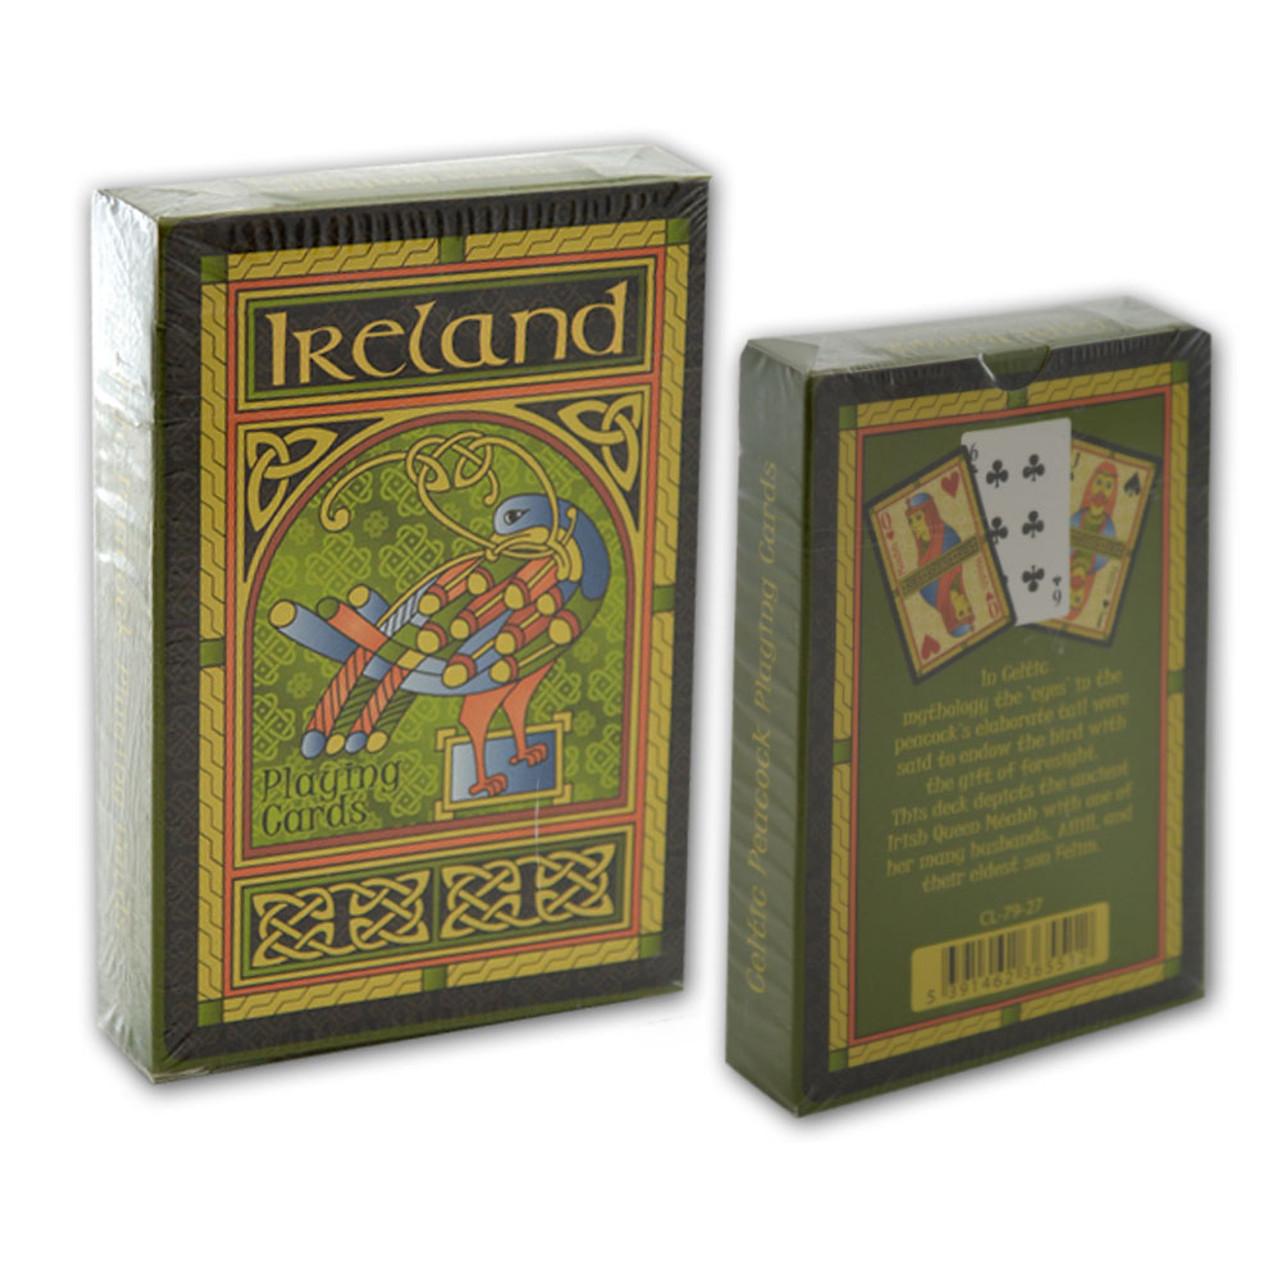 Irish Playing Cards in 3 Styles